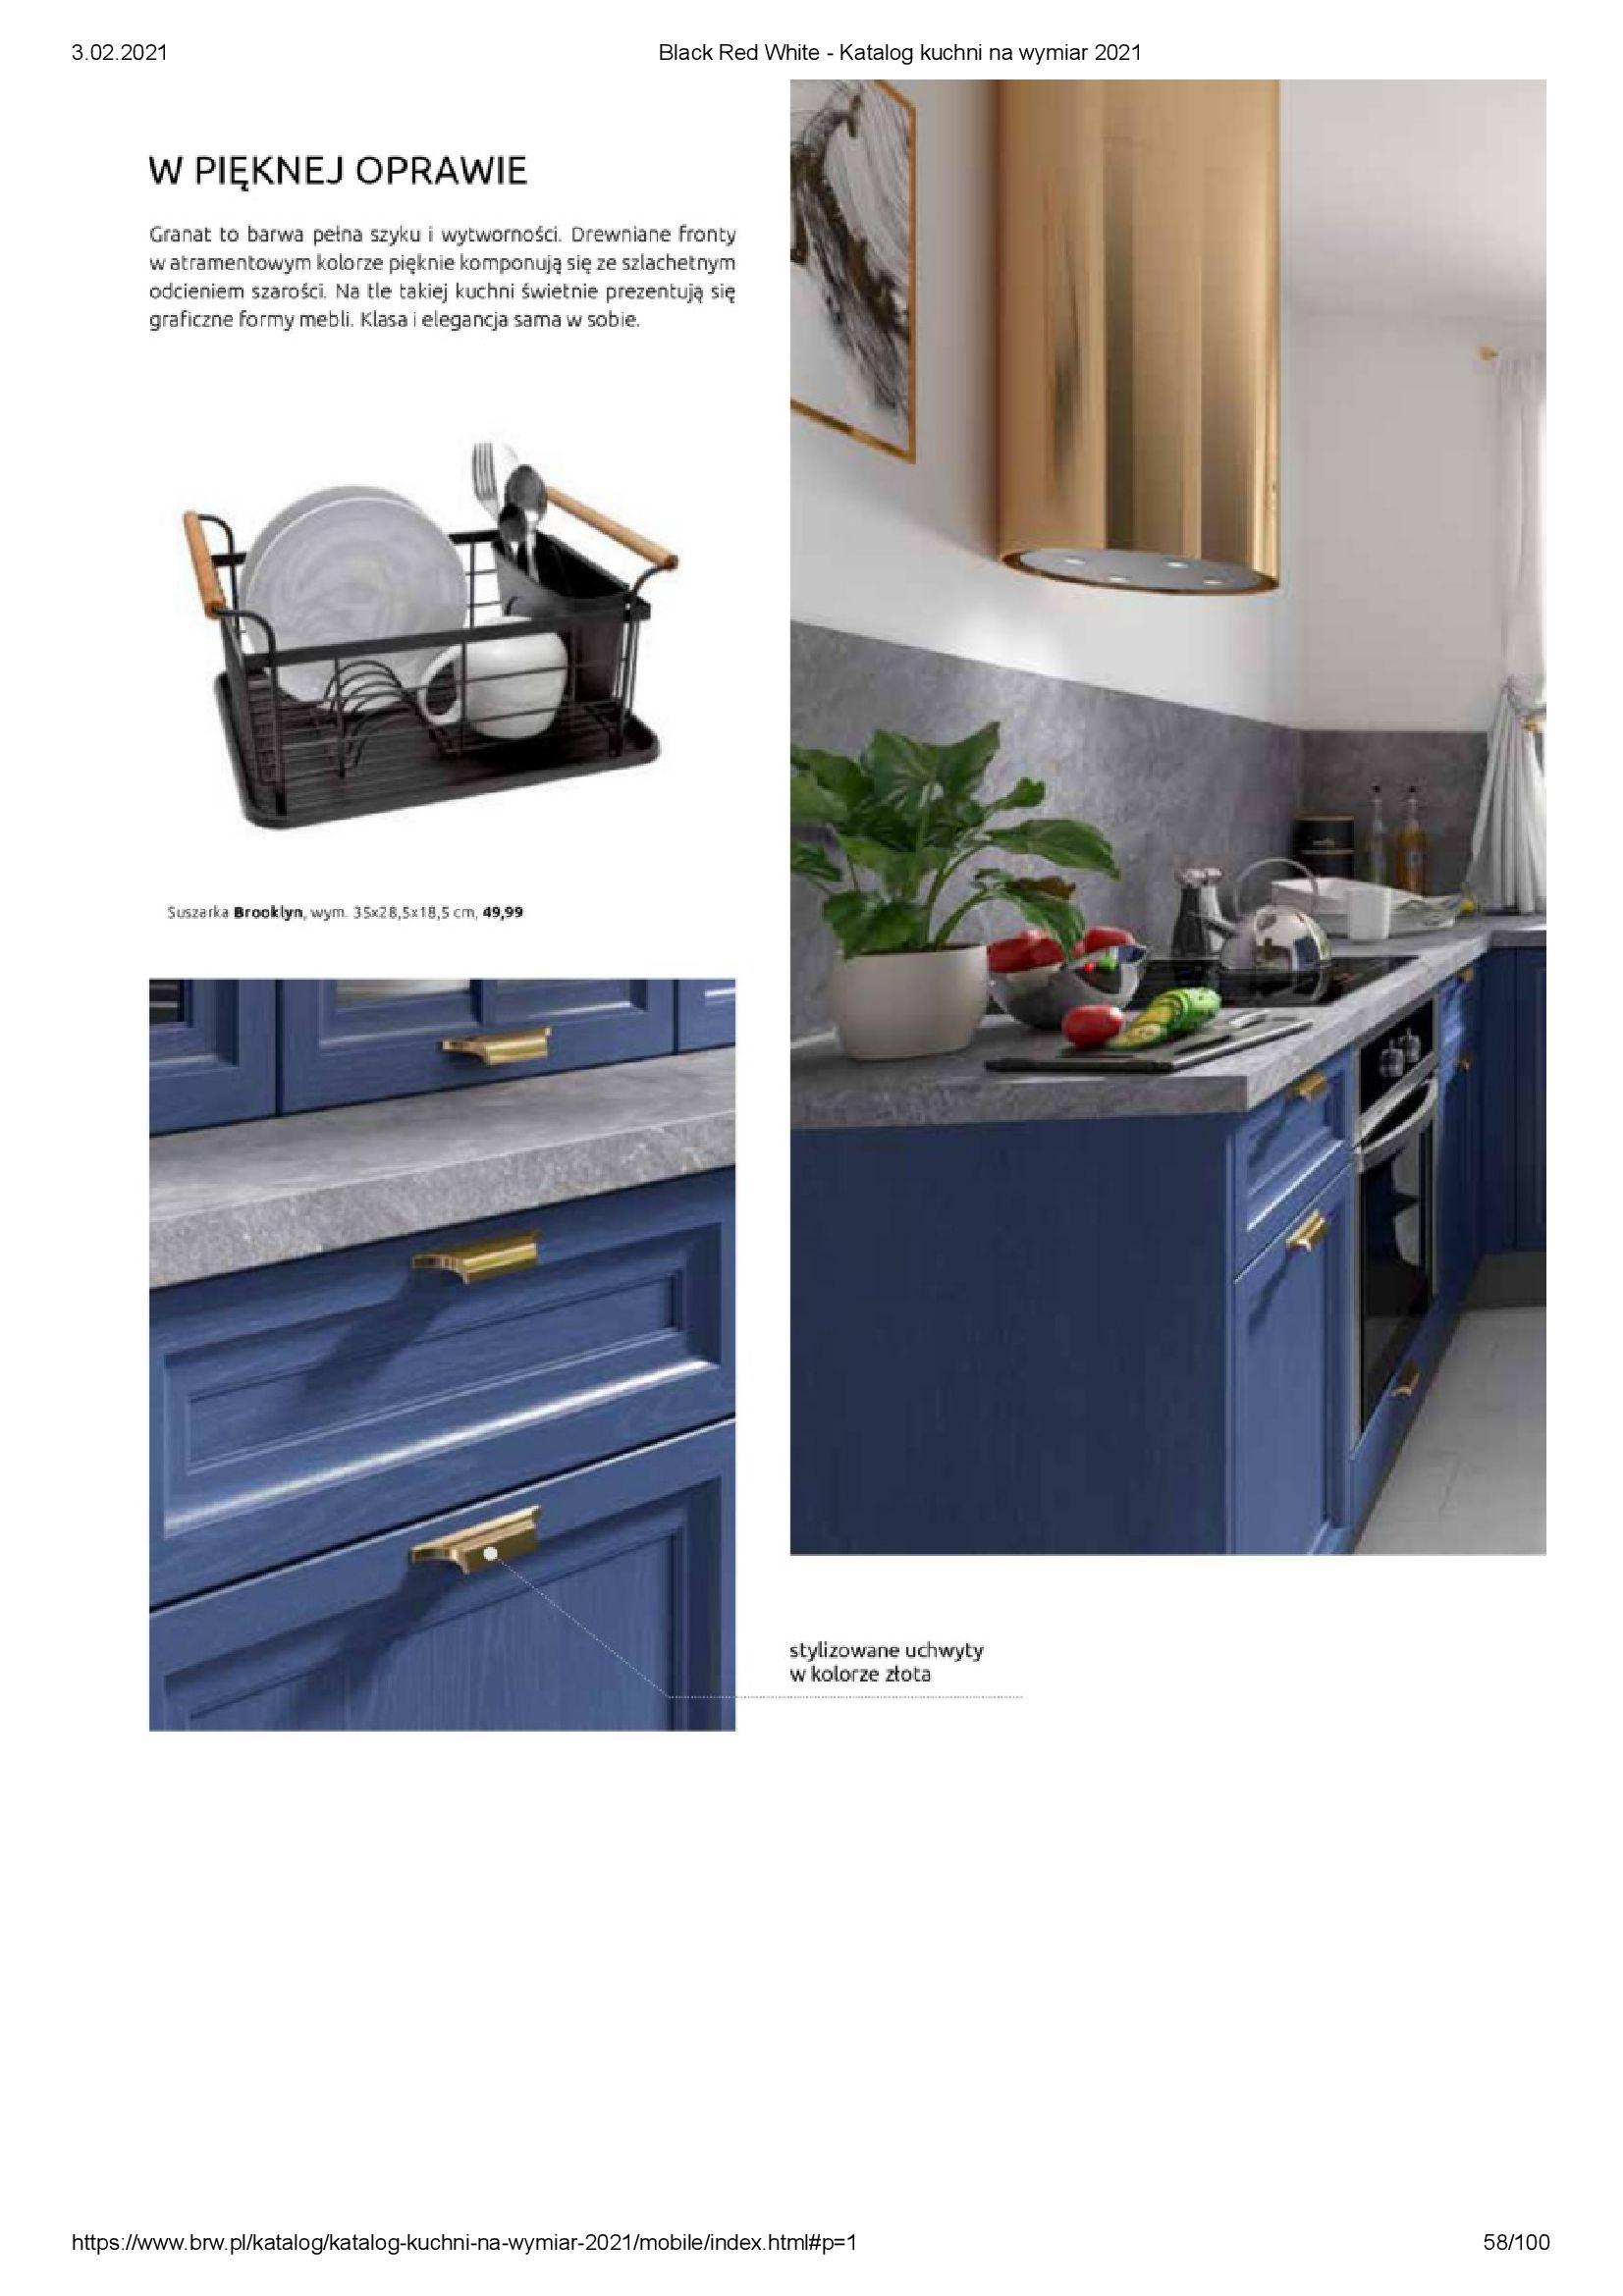 Gazetka Black Red White: Katalog - Kuchnie na wymiar Senso Kitchens 2021 2021-01-01 page-58